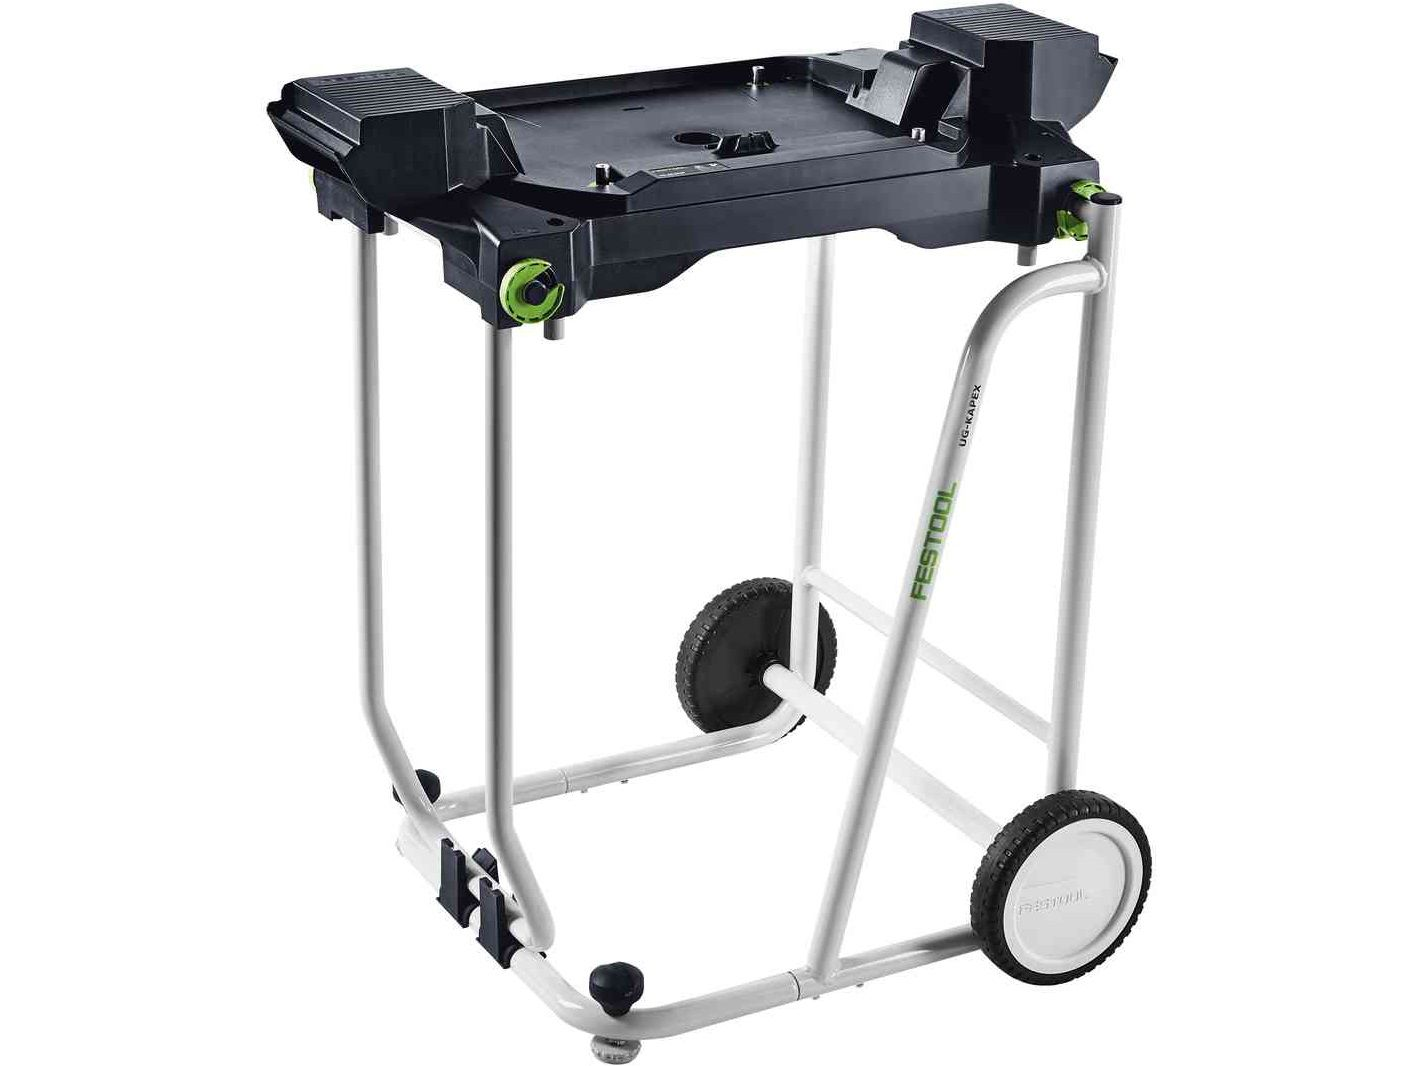 Pojízdný stojan pro pilu Festool KS 60 - 13kg (Festool UG-KS 60), kód: 200129